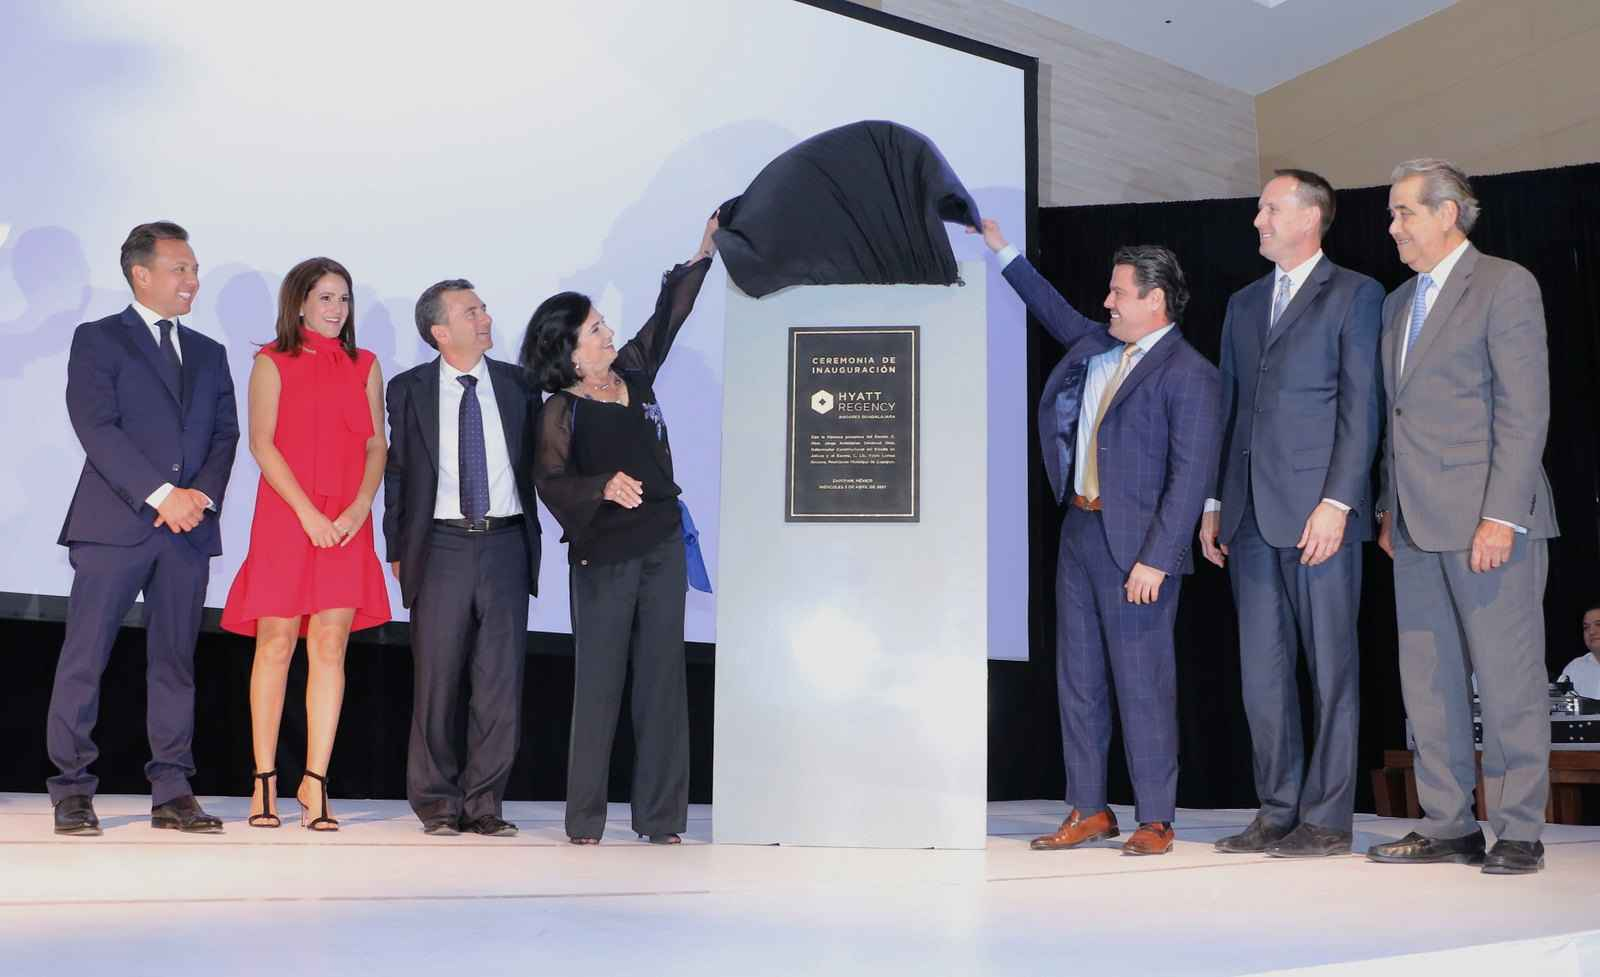 Se inauguró el Hyatt Regency Andares